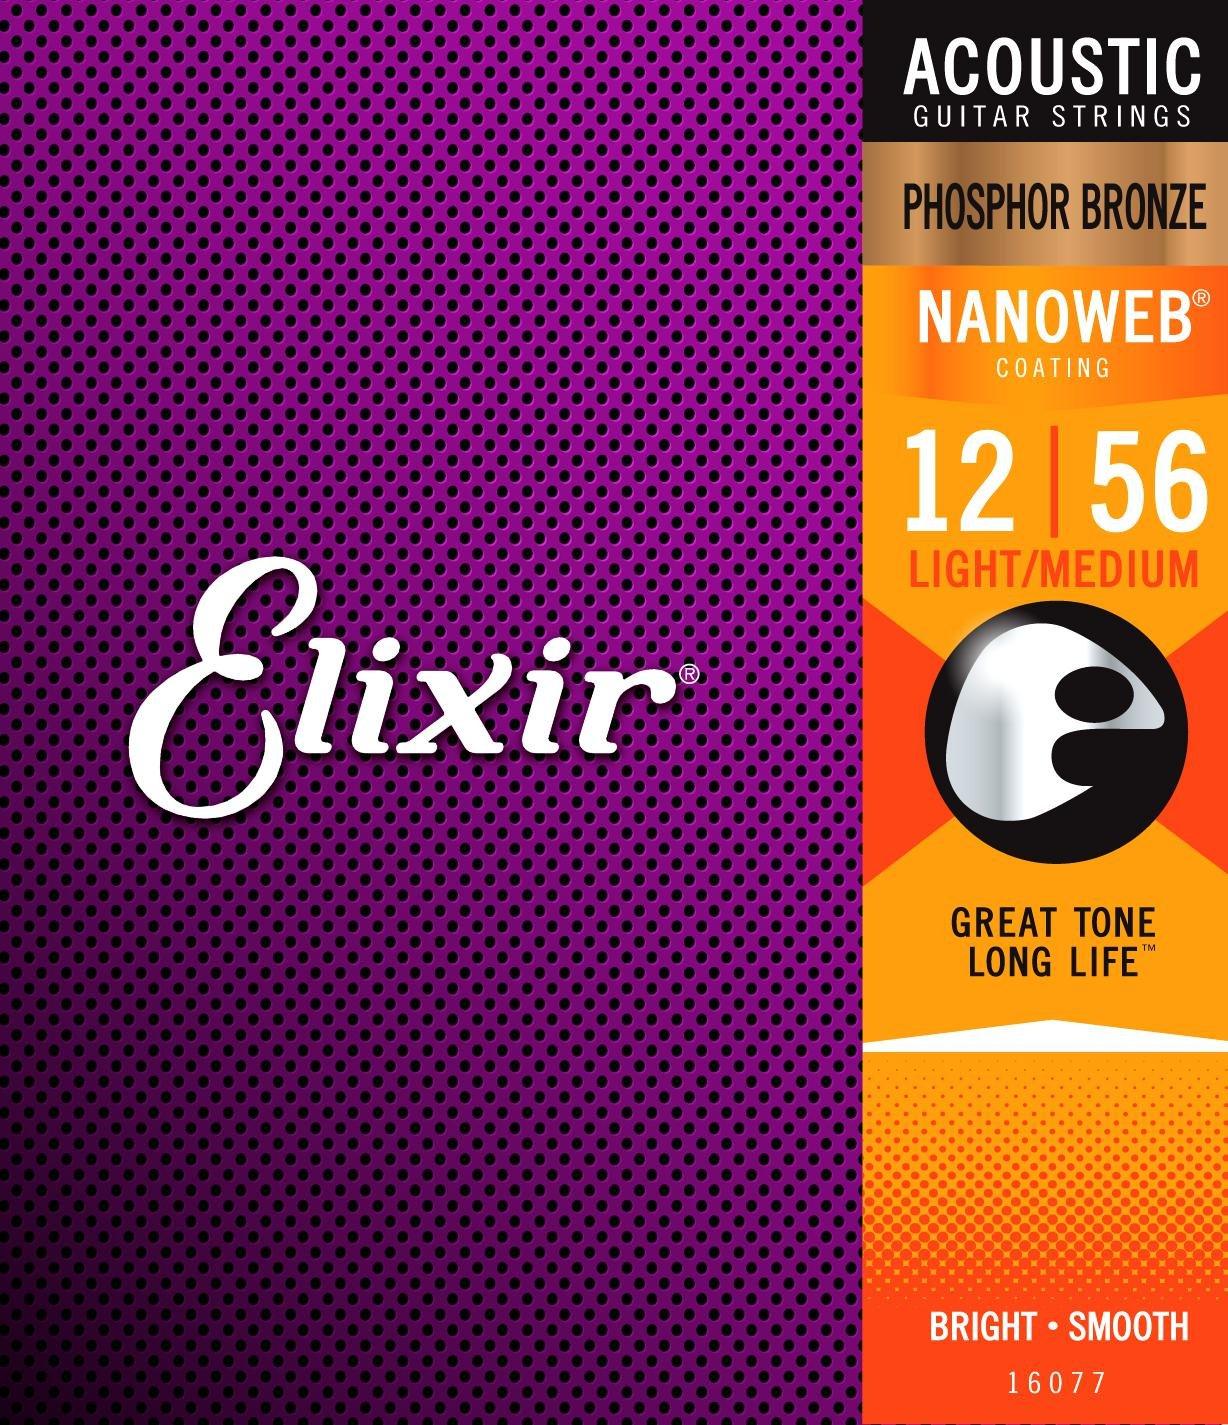 Elixir Original 16077 Acoustic Phosphor Bronze With NANOWEB Coating Light-Medium 12-56